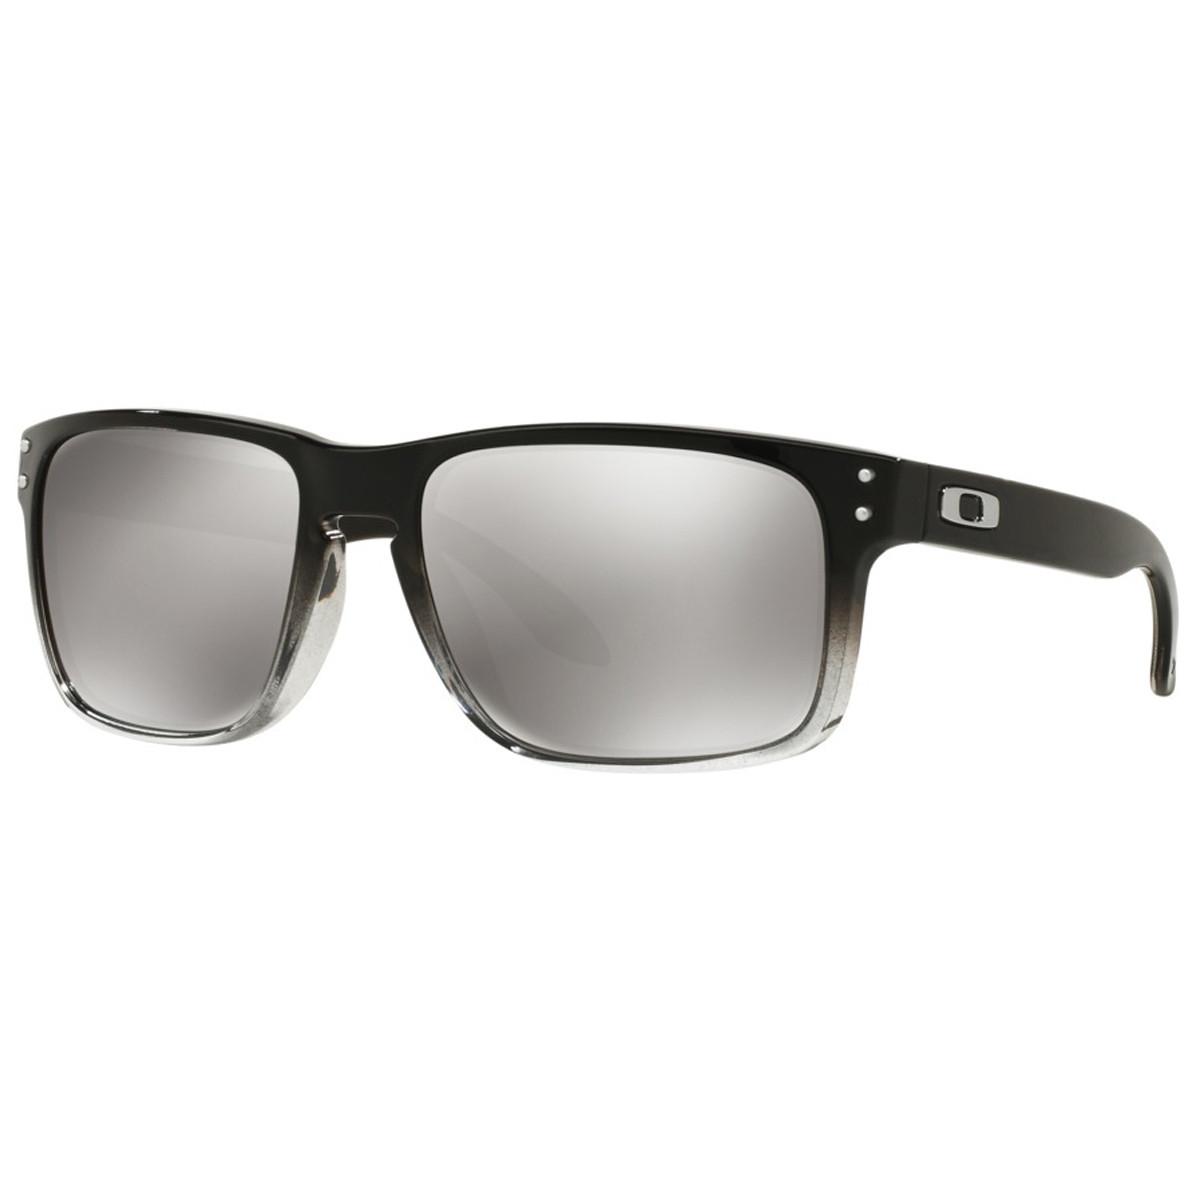 Óculos Oakley Holbrook Dark Ink Fade  Lente Chorme Iridium Polarizado 74b38d3368